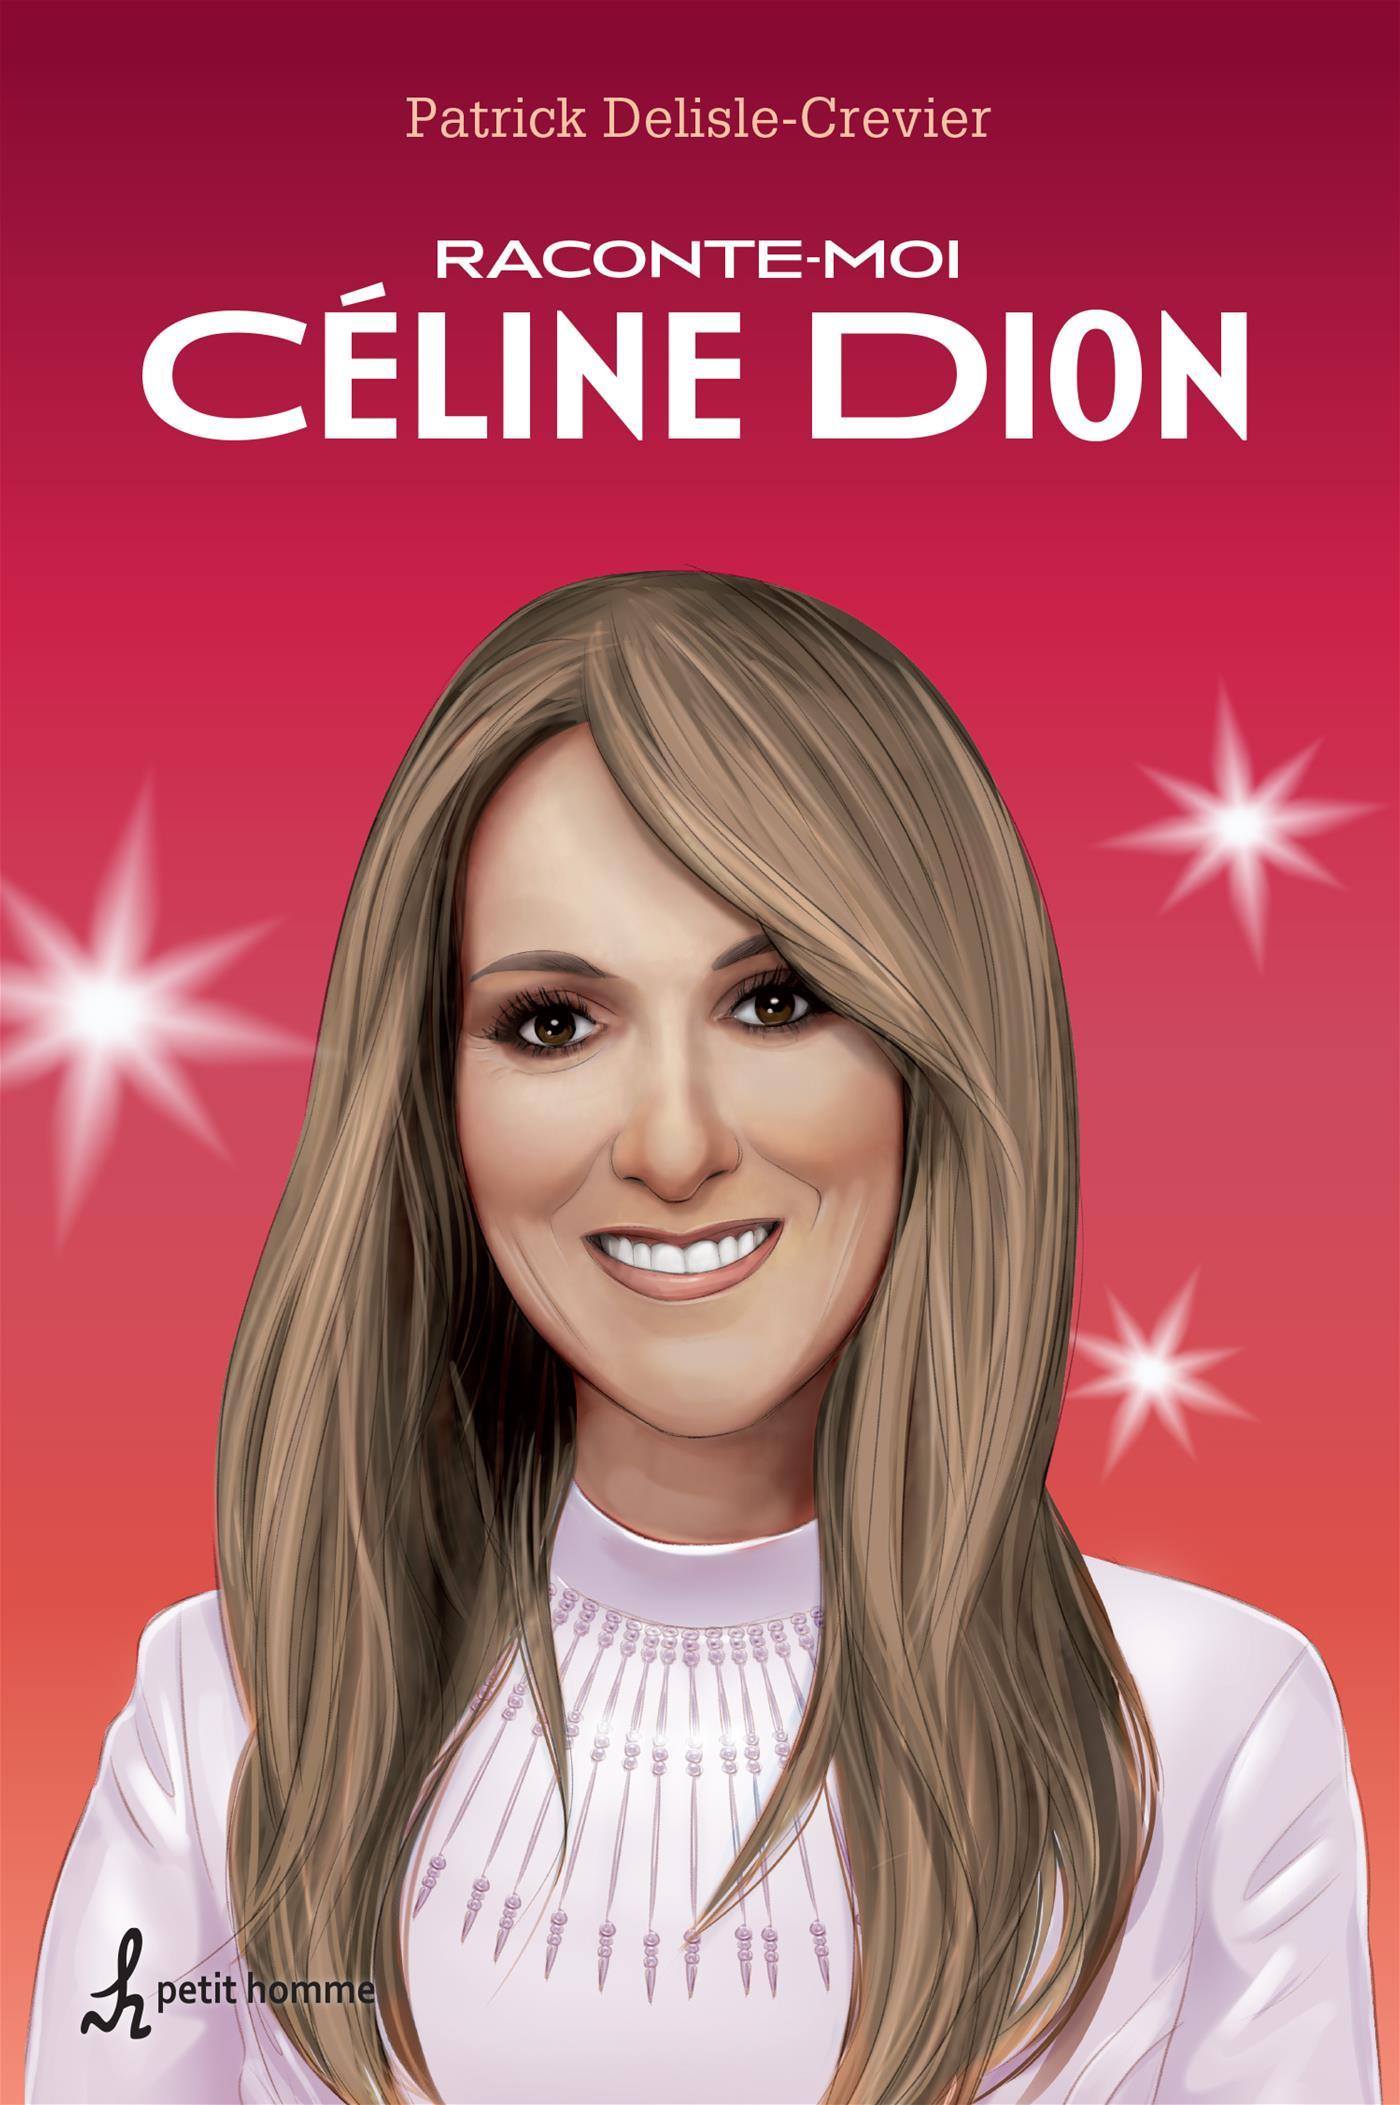 Raconte-moi Céline Dion